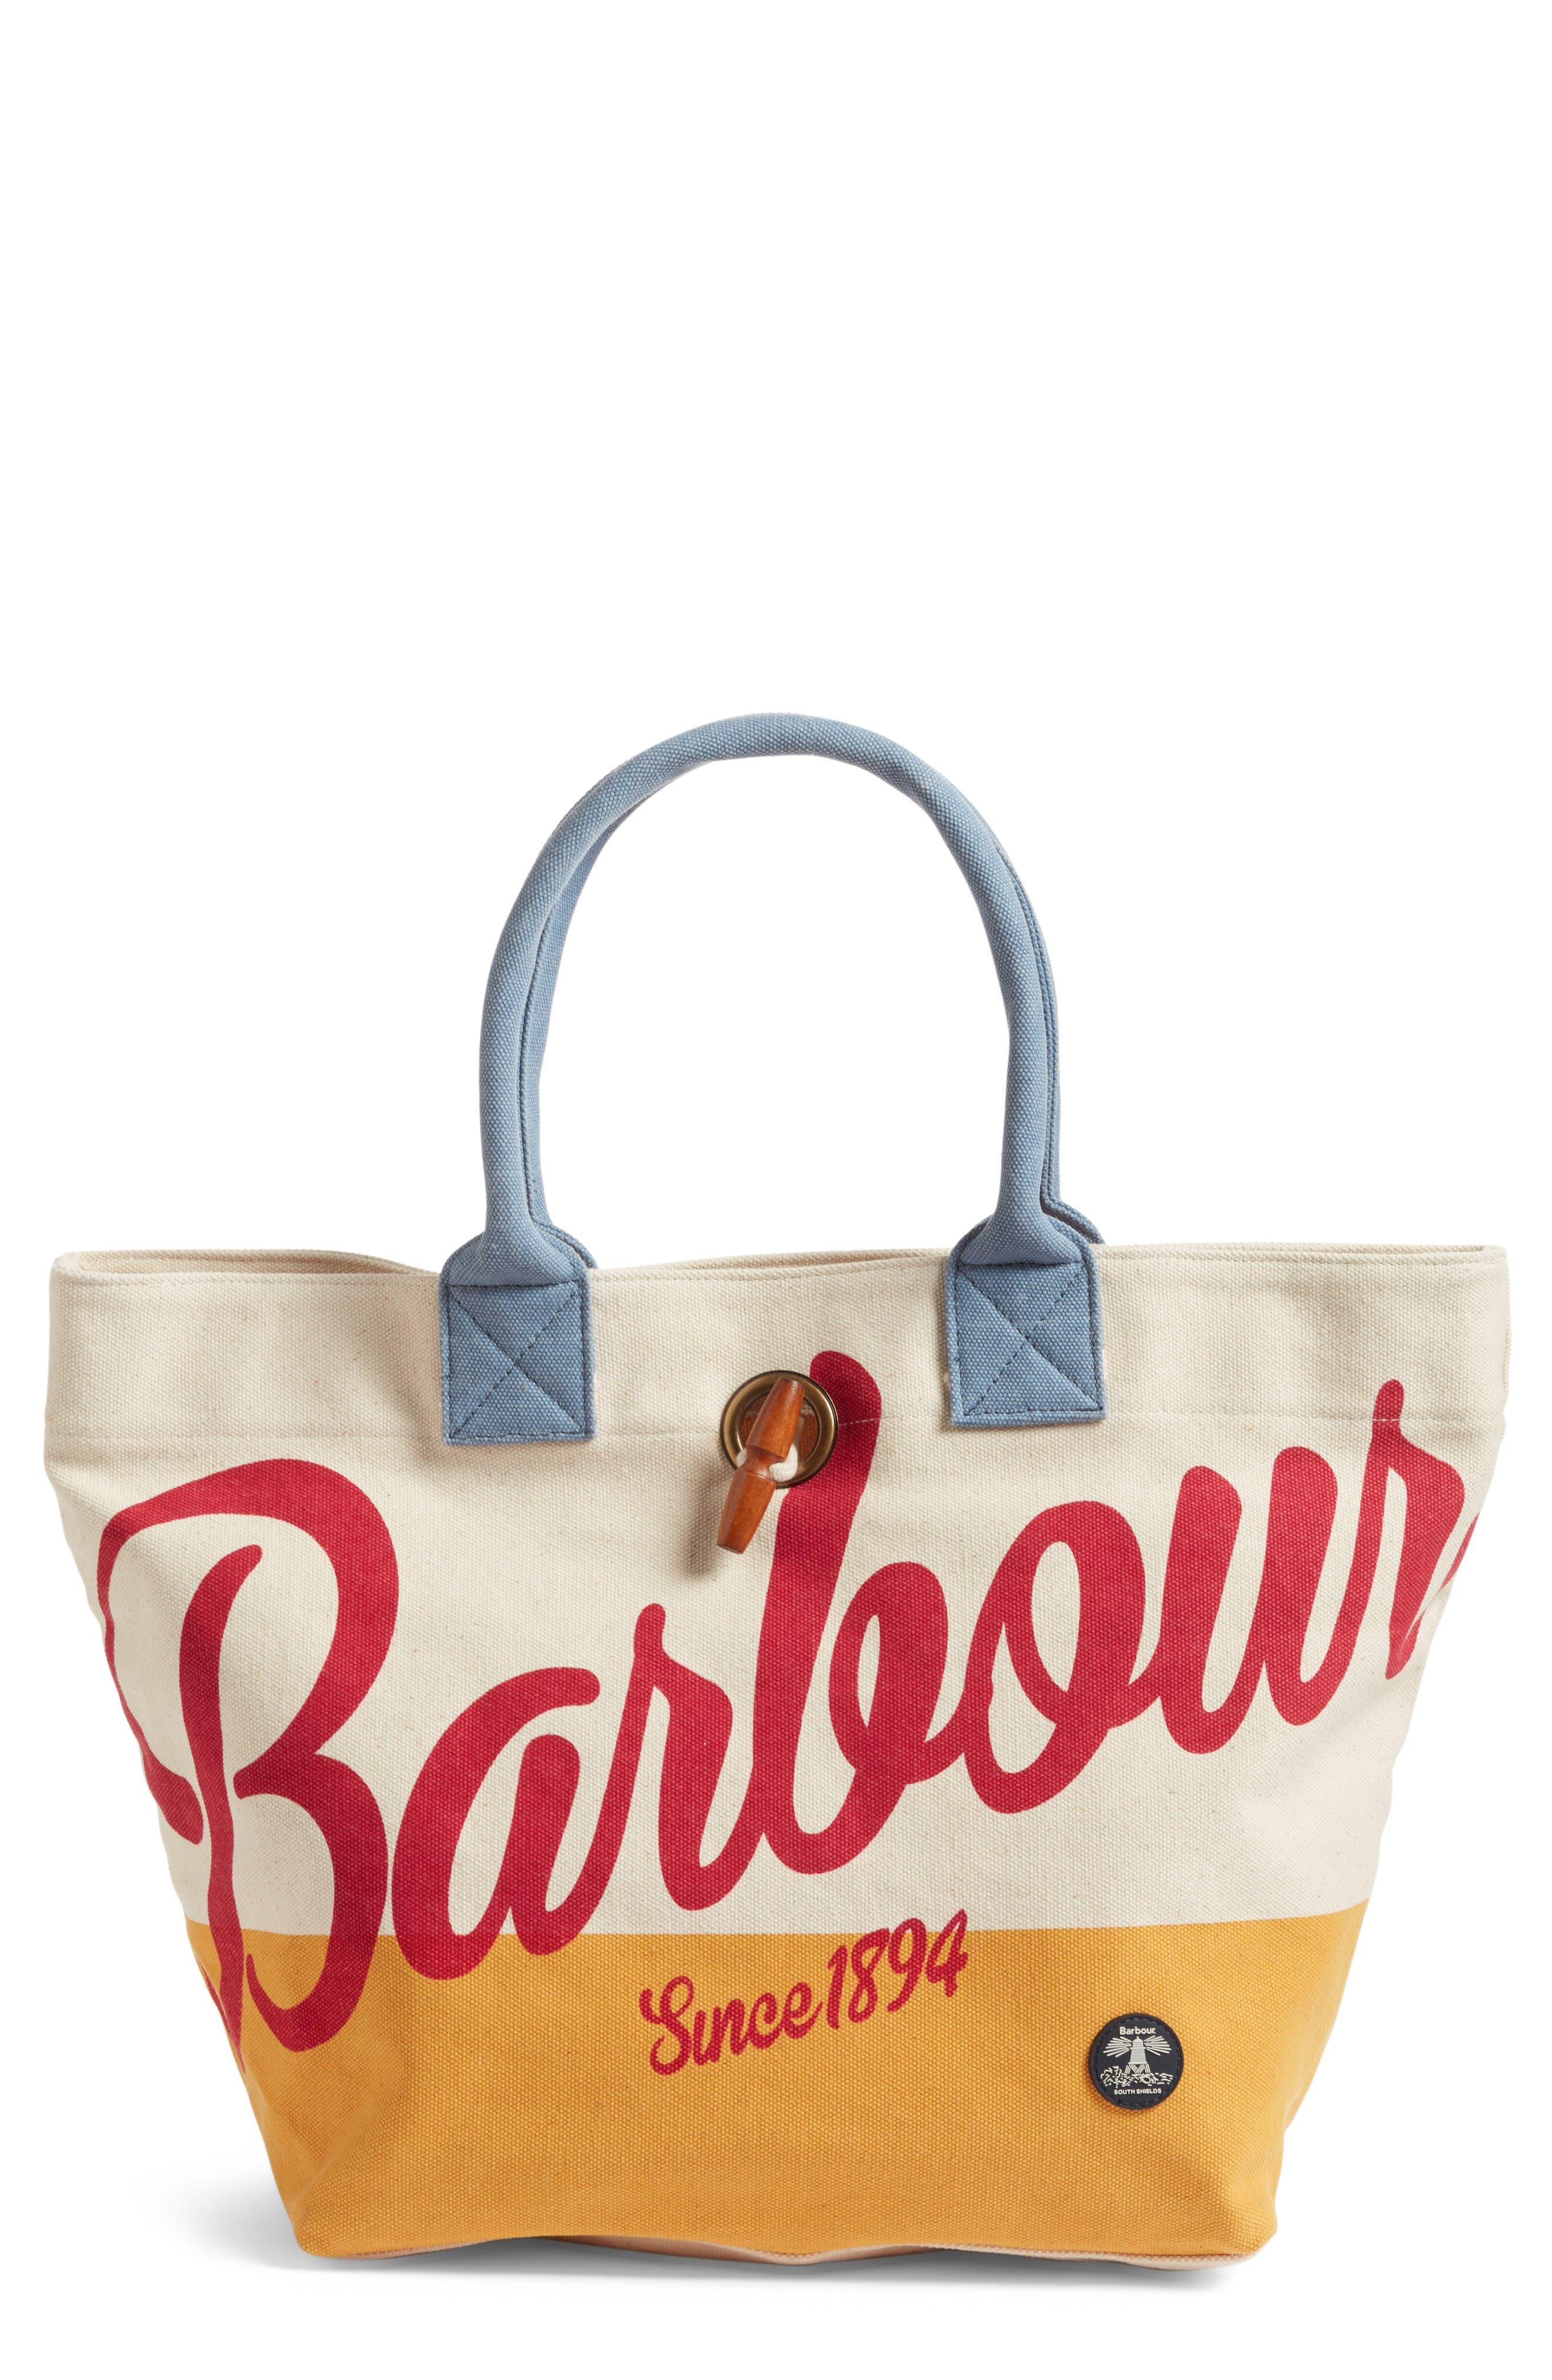 Barbour Single Shopper Tote